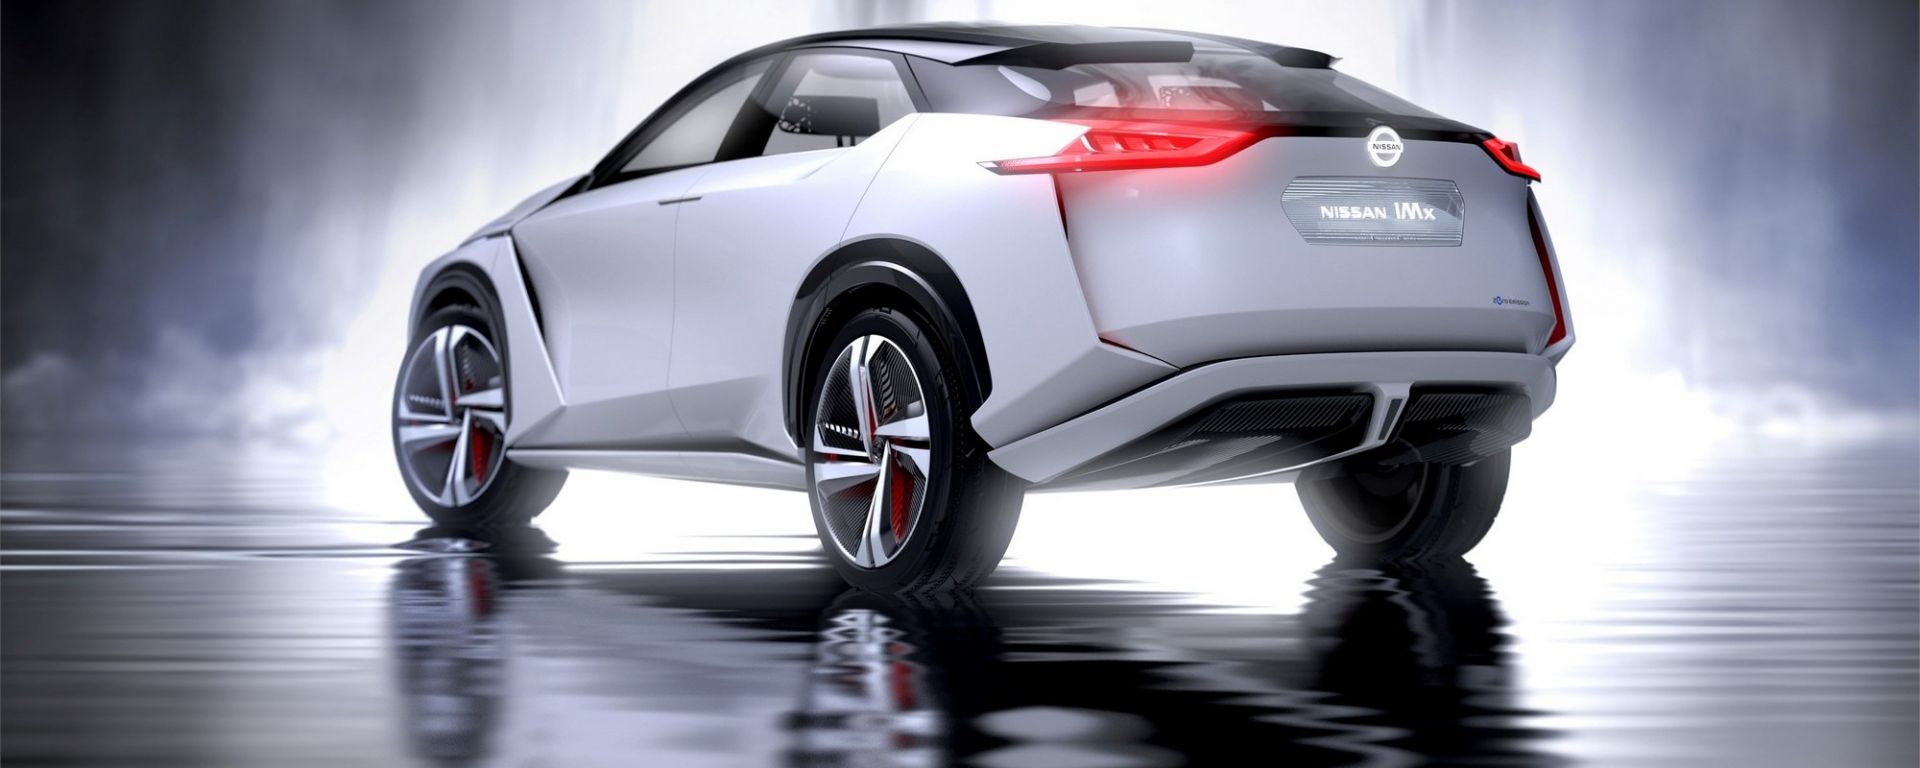 Nissan IMx Concept, guida autonoma e zero emissioni